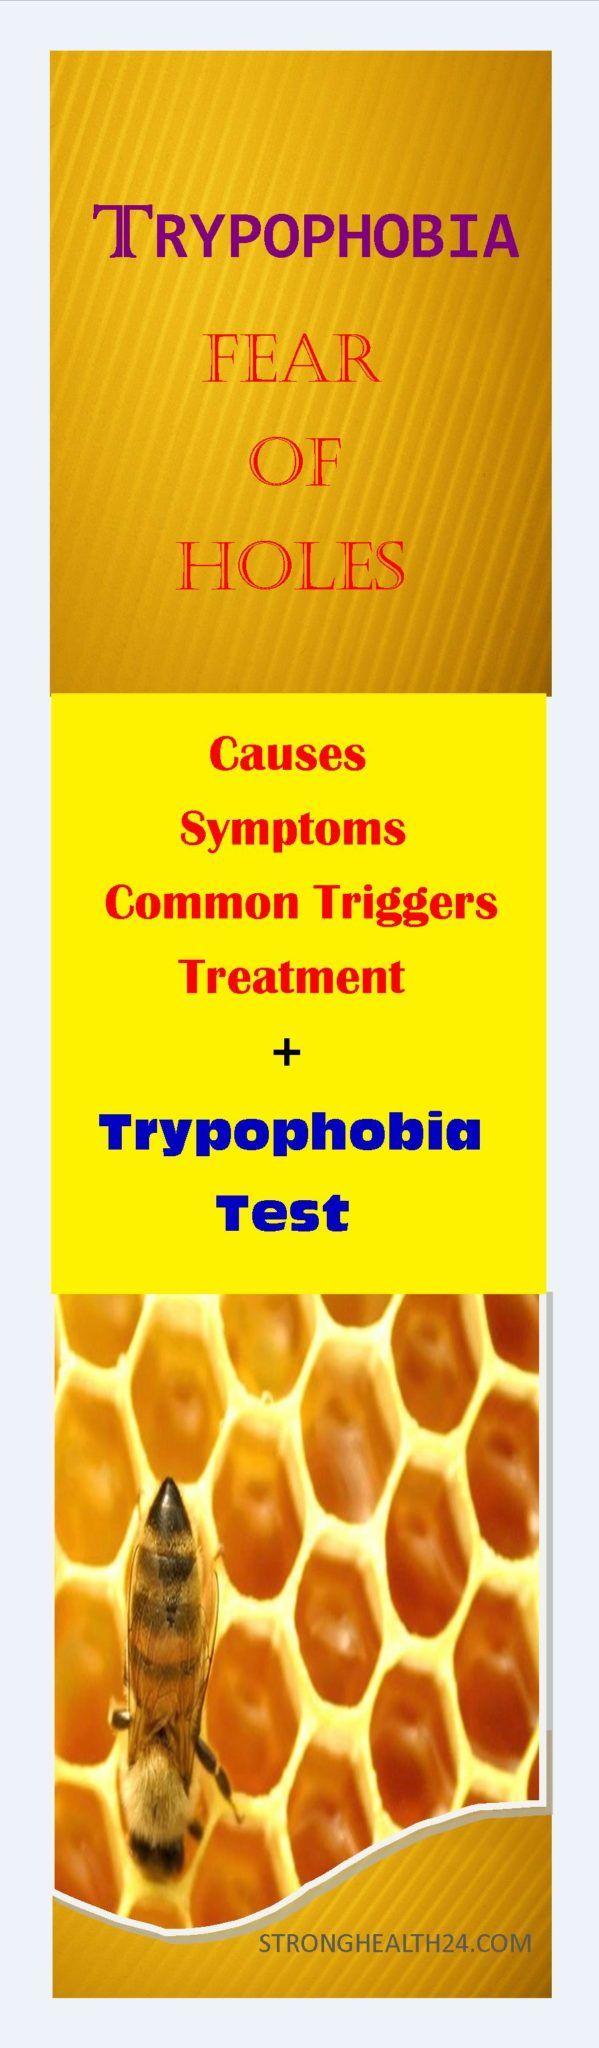 Fear of Holes - Trypophobia | Trypophobia, Phobia of holes ...